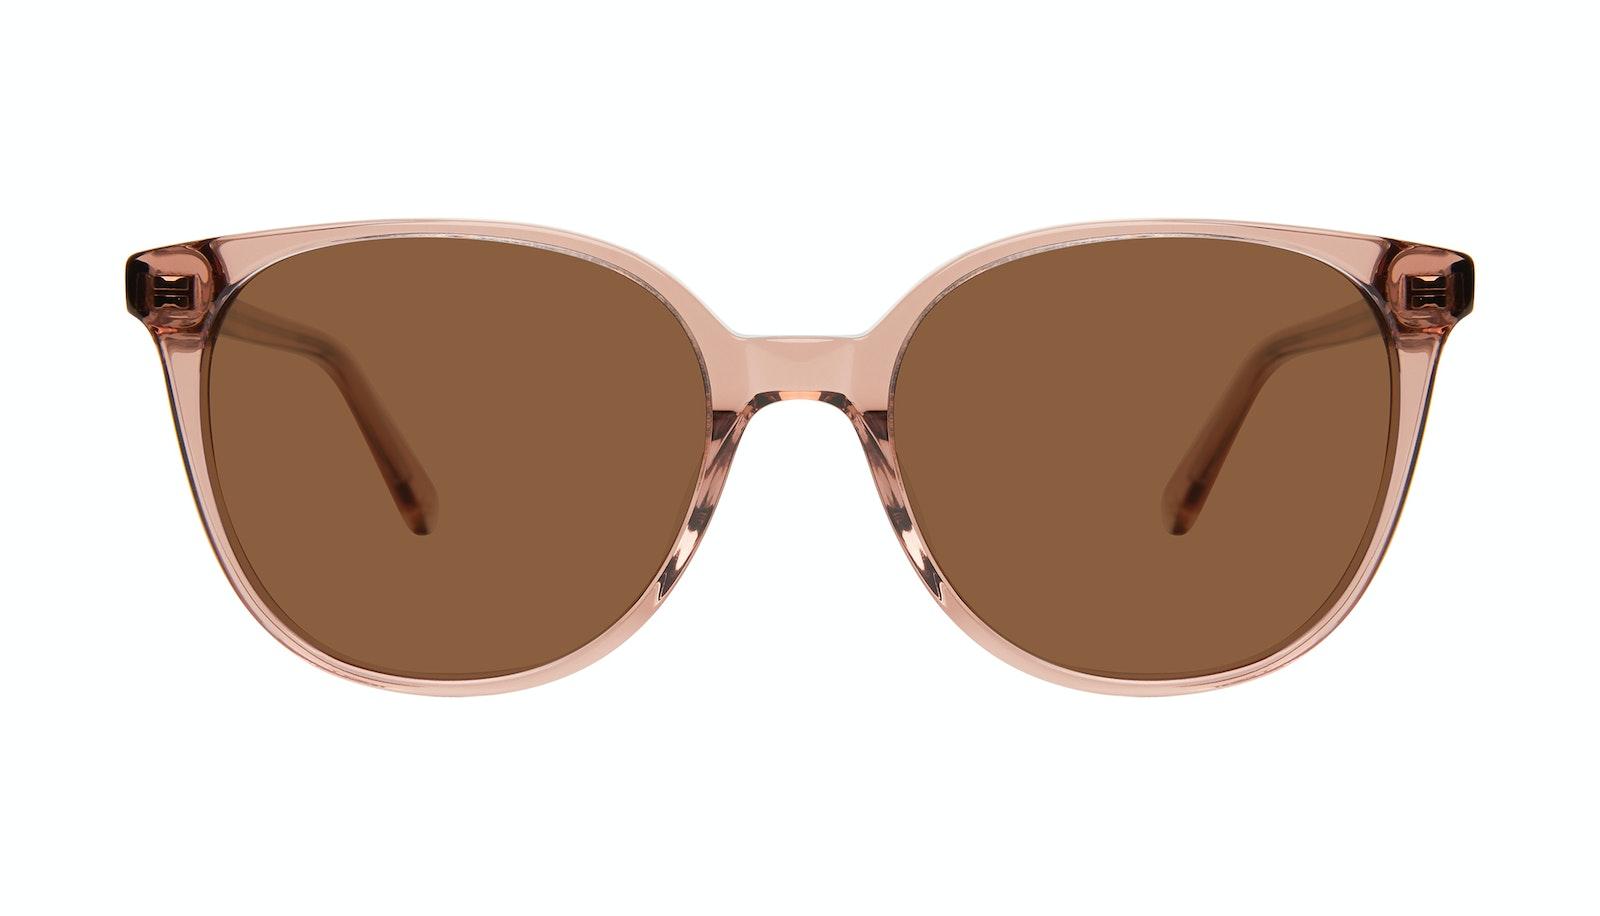 Affordable Fashion Glasses Square Sunglasses Women Novel Rose